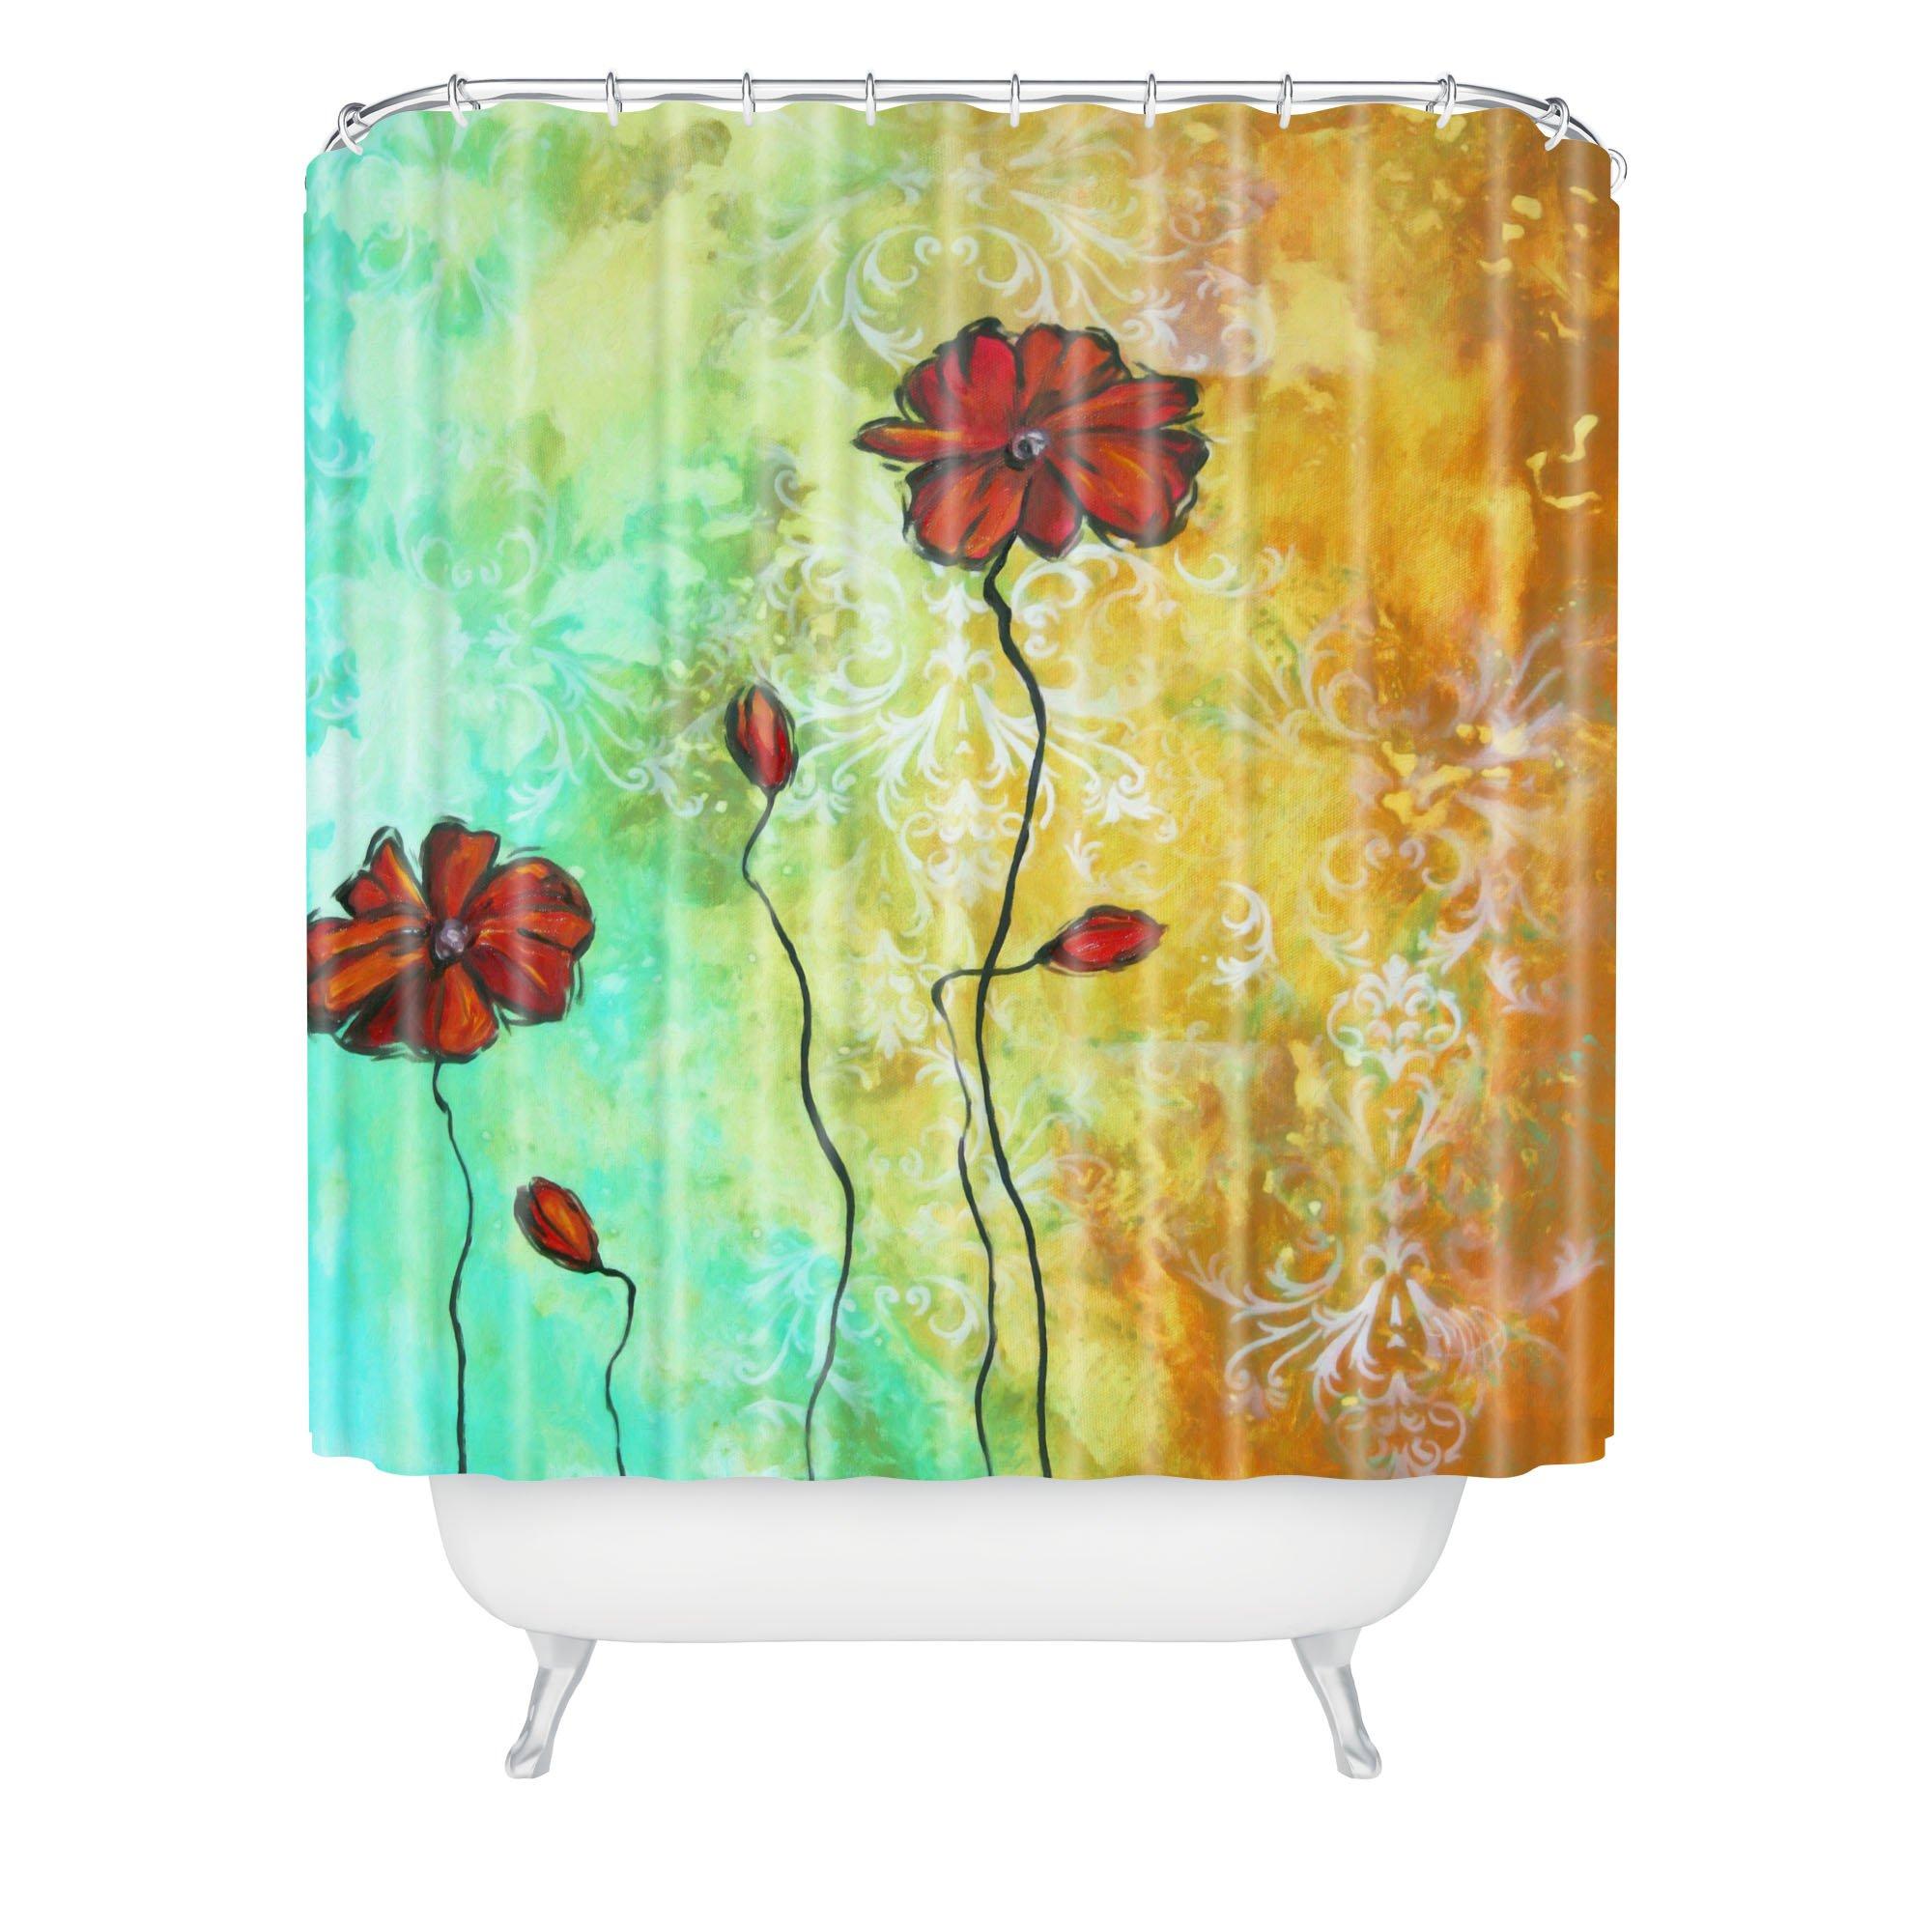 Deny Designs Madart Poppy Love Shower Curtain, 69'' x 90''